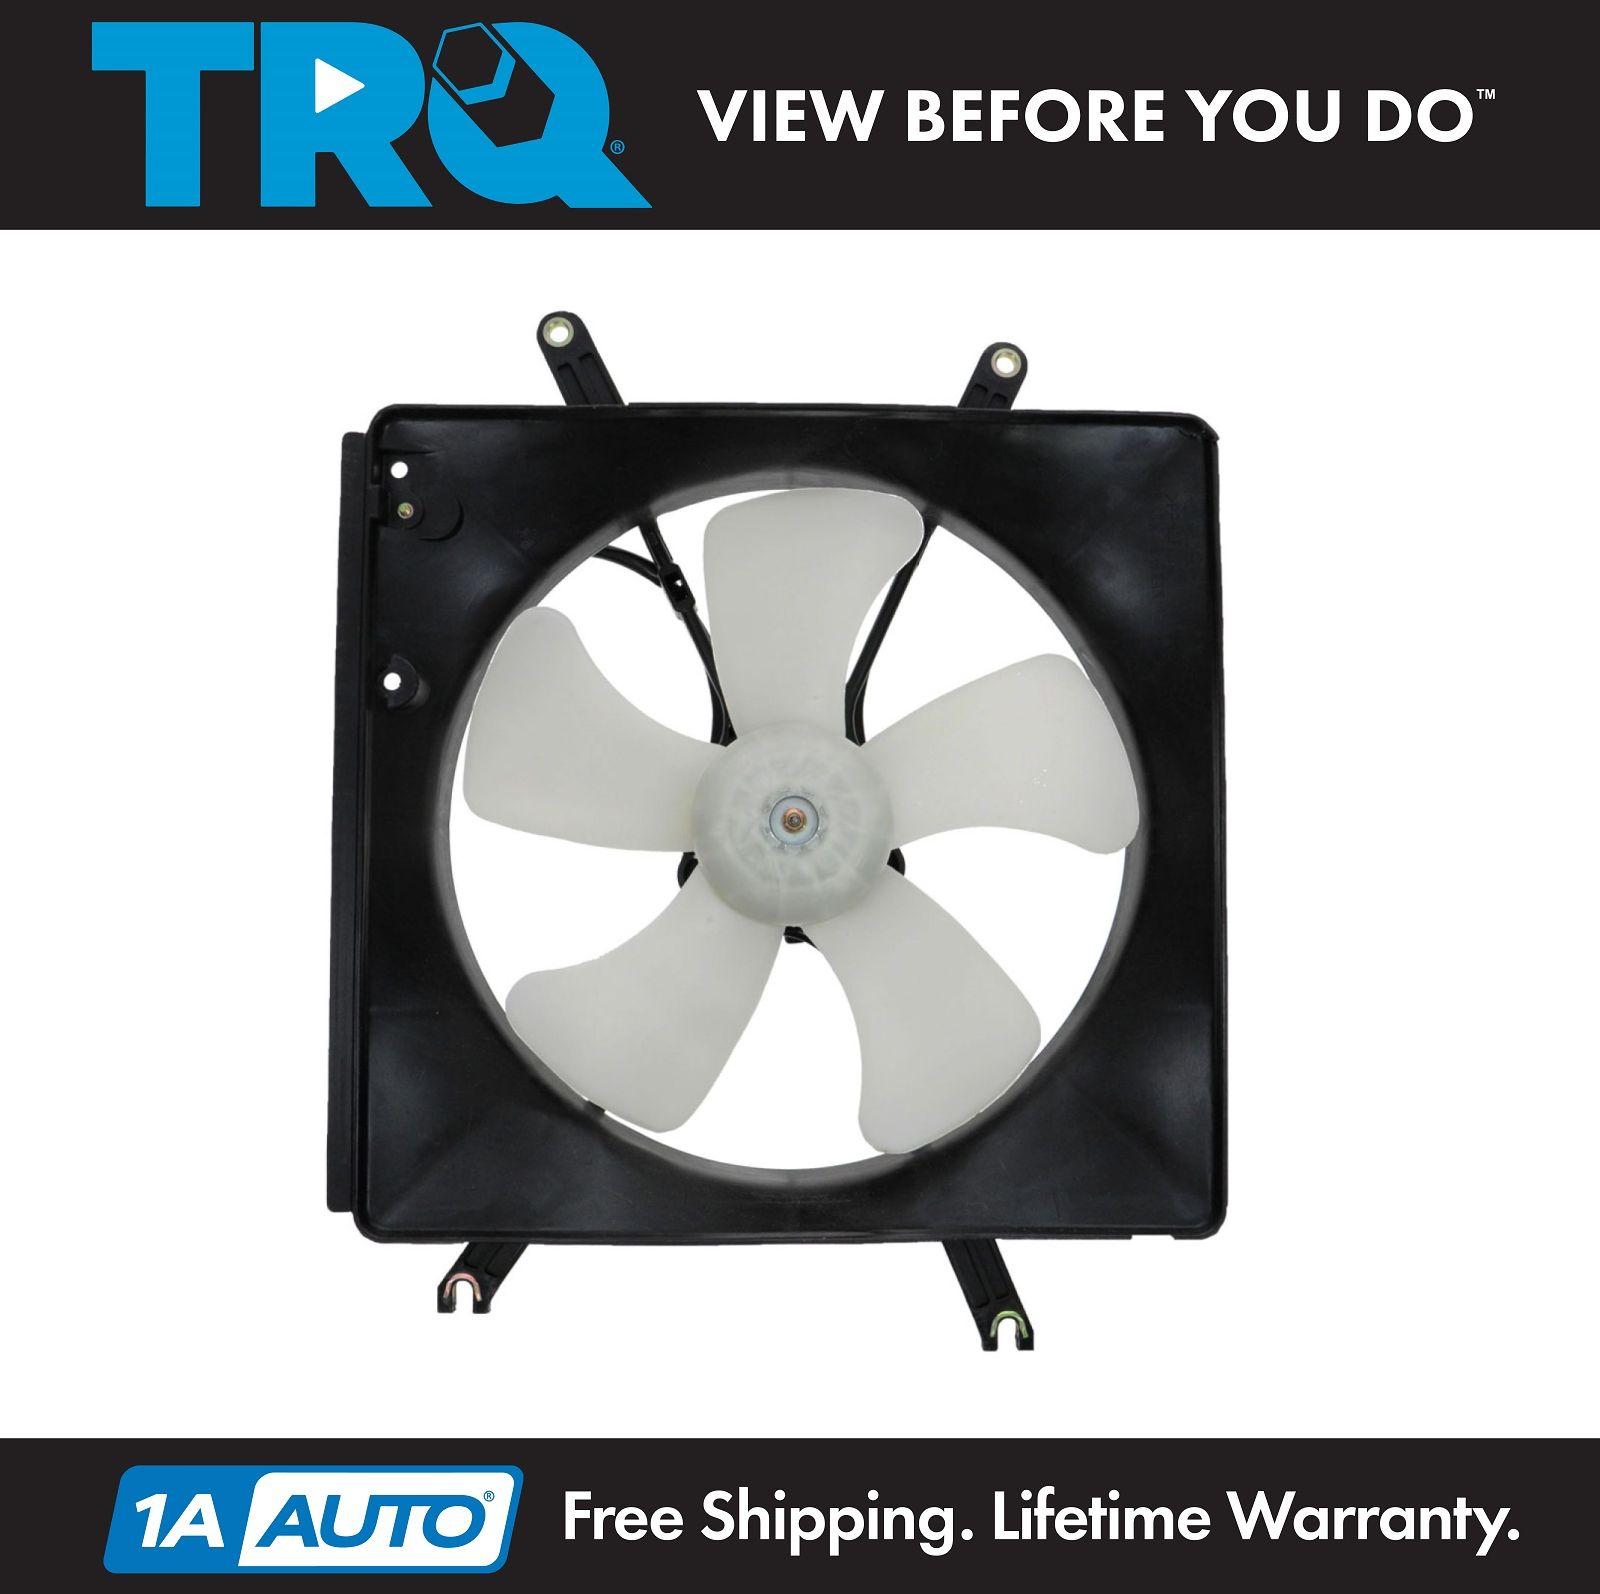 Radiator Cooling Fan 5 Blade For 94-01 Acura Integra